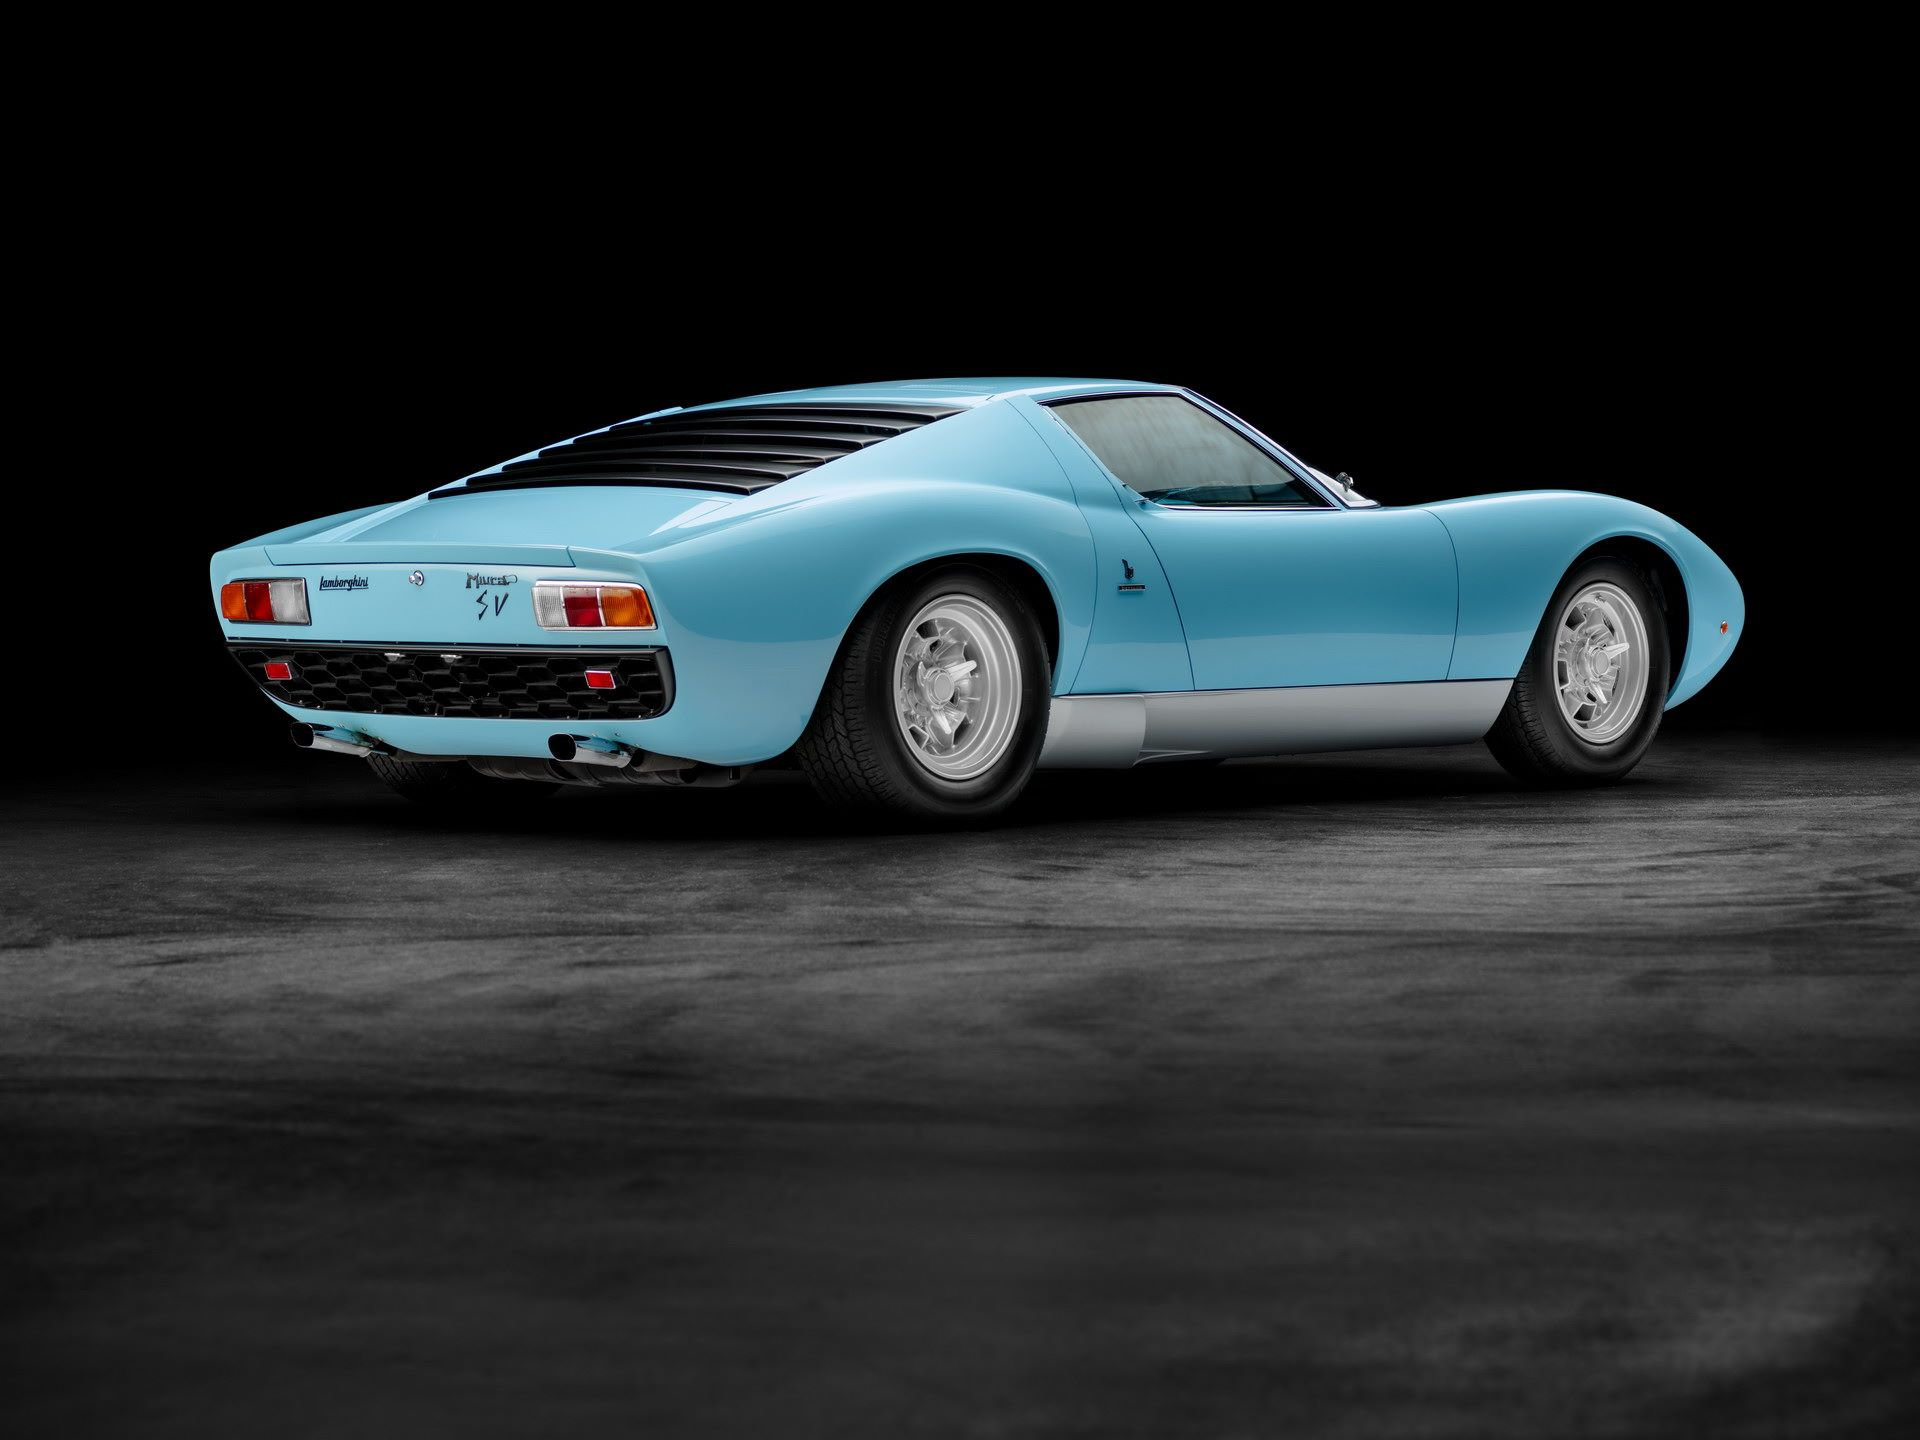 Lamborghini-Miura-SV-turns-50-6